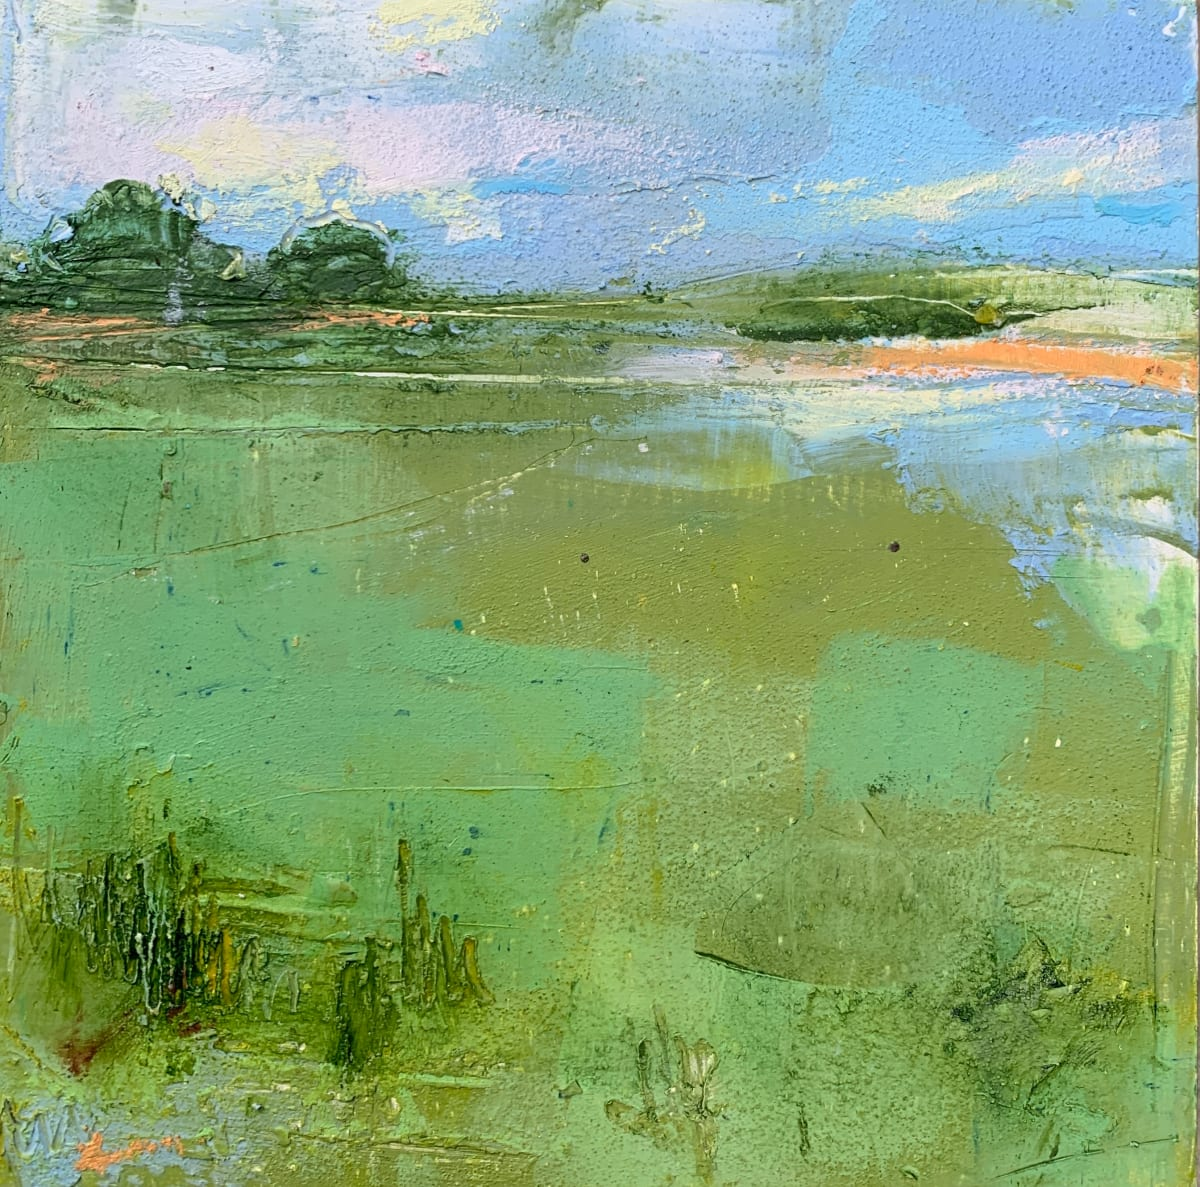 Little Landscape #5 by Sally Hootnick